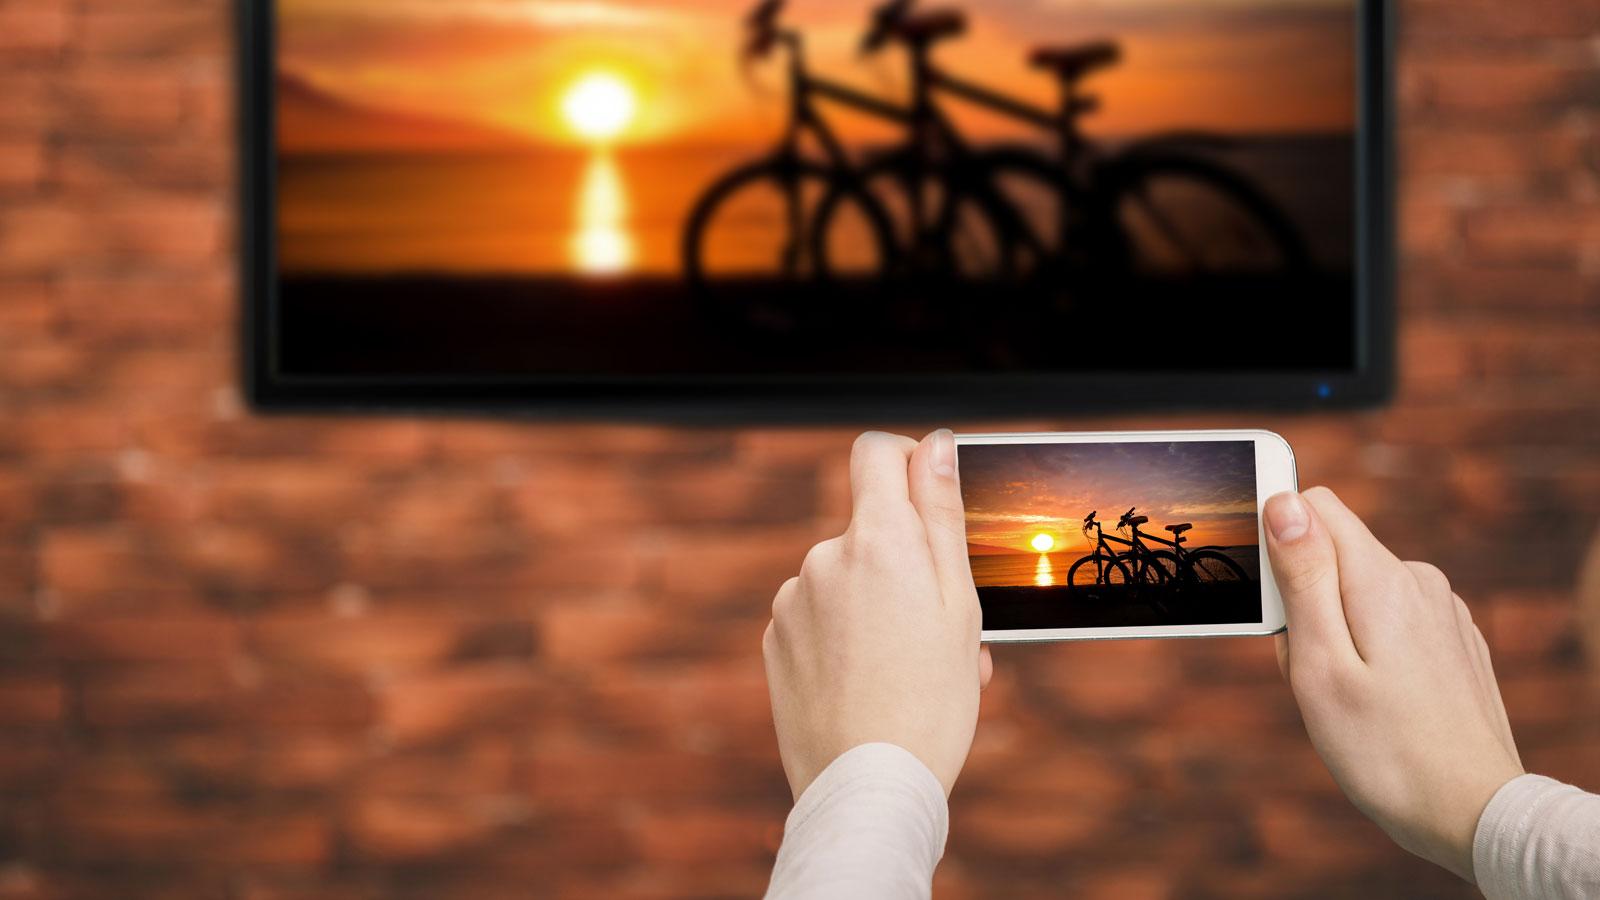 Adapter, Apps & Co.: Handy mit dem TV verbinden – so geht's